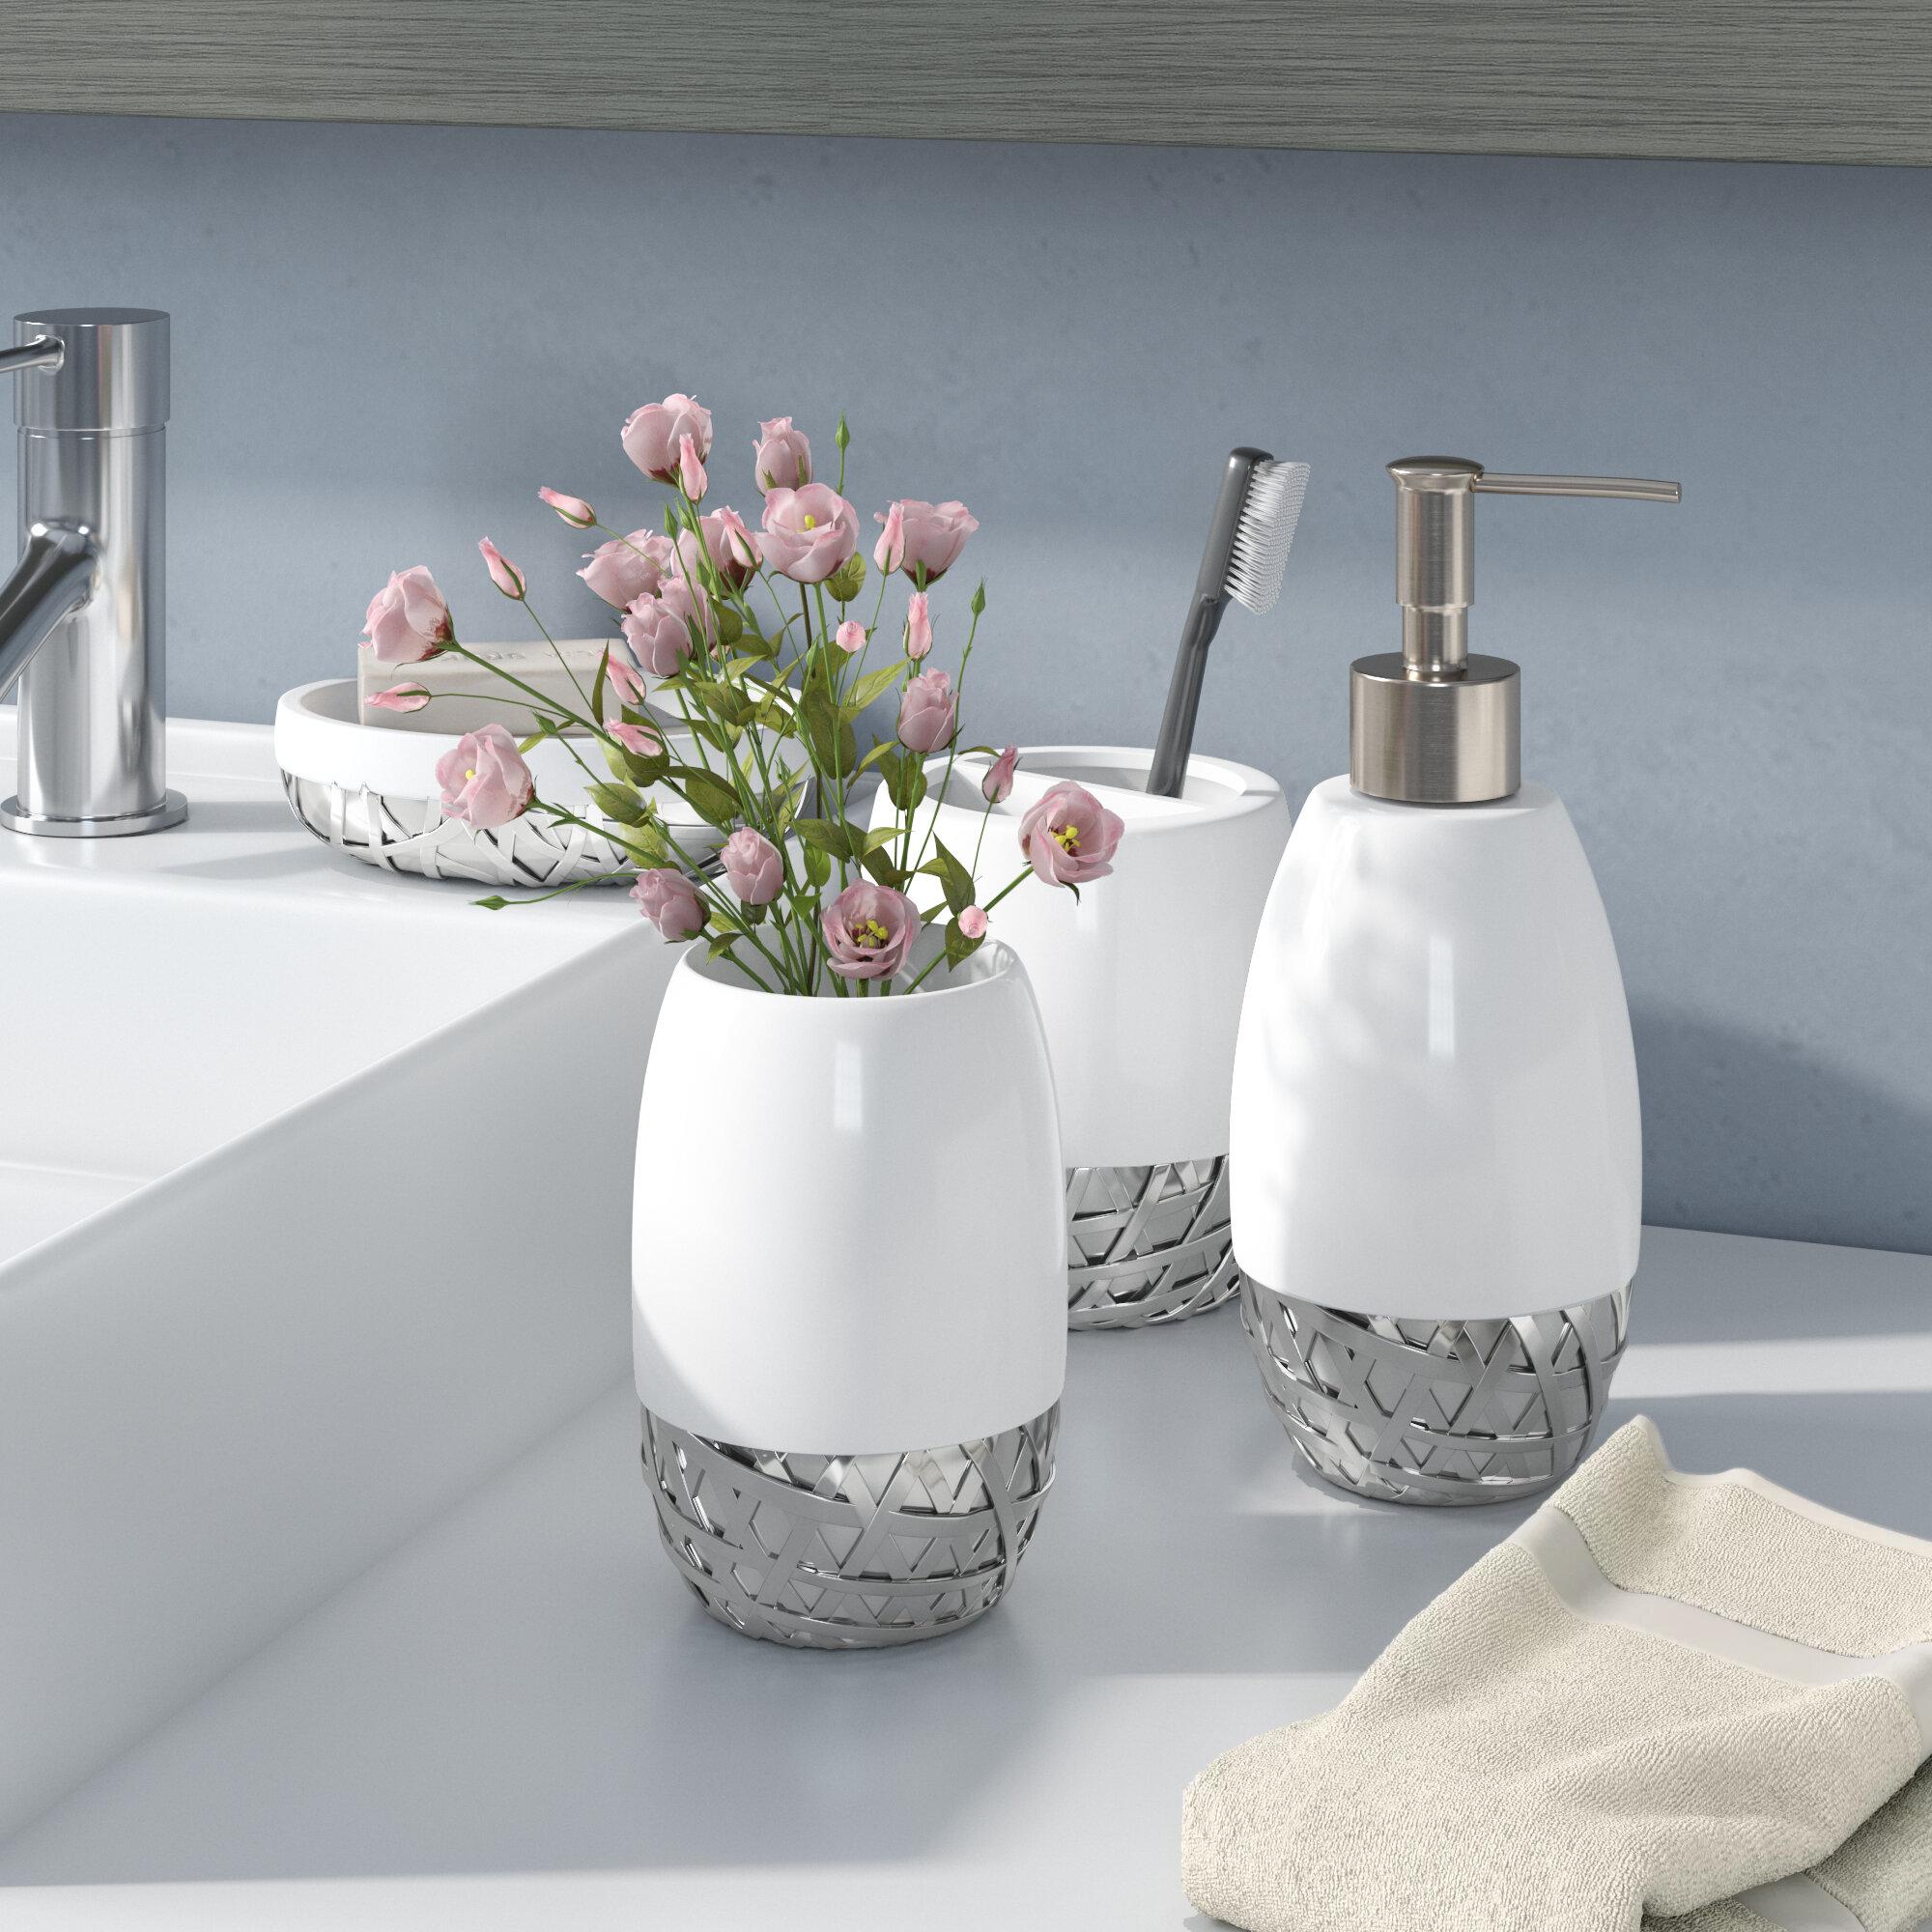 Orren Ellis Stiltner 4 Piece Bathroom